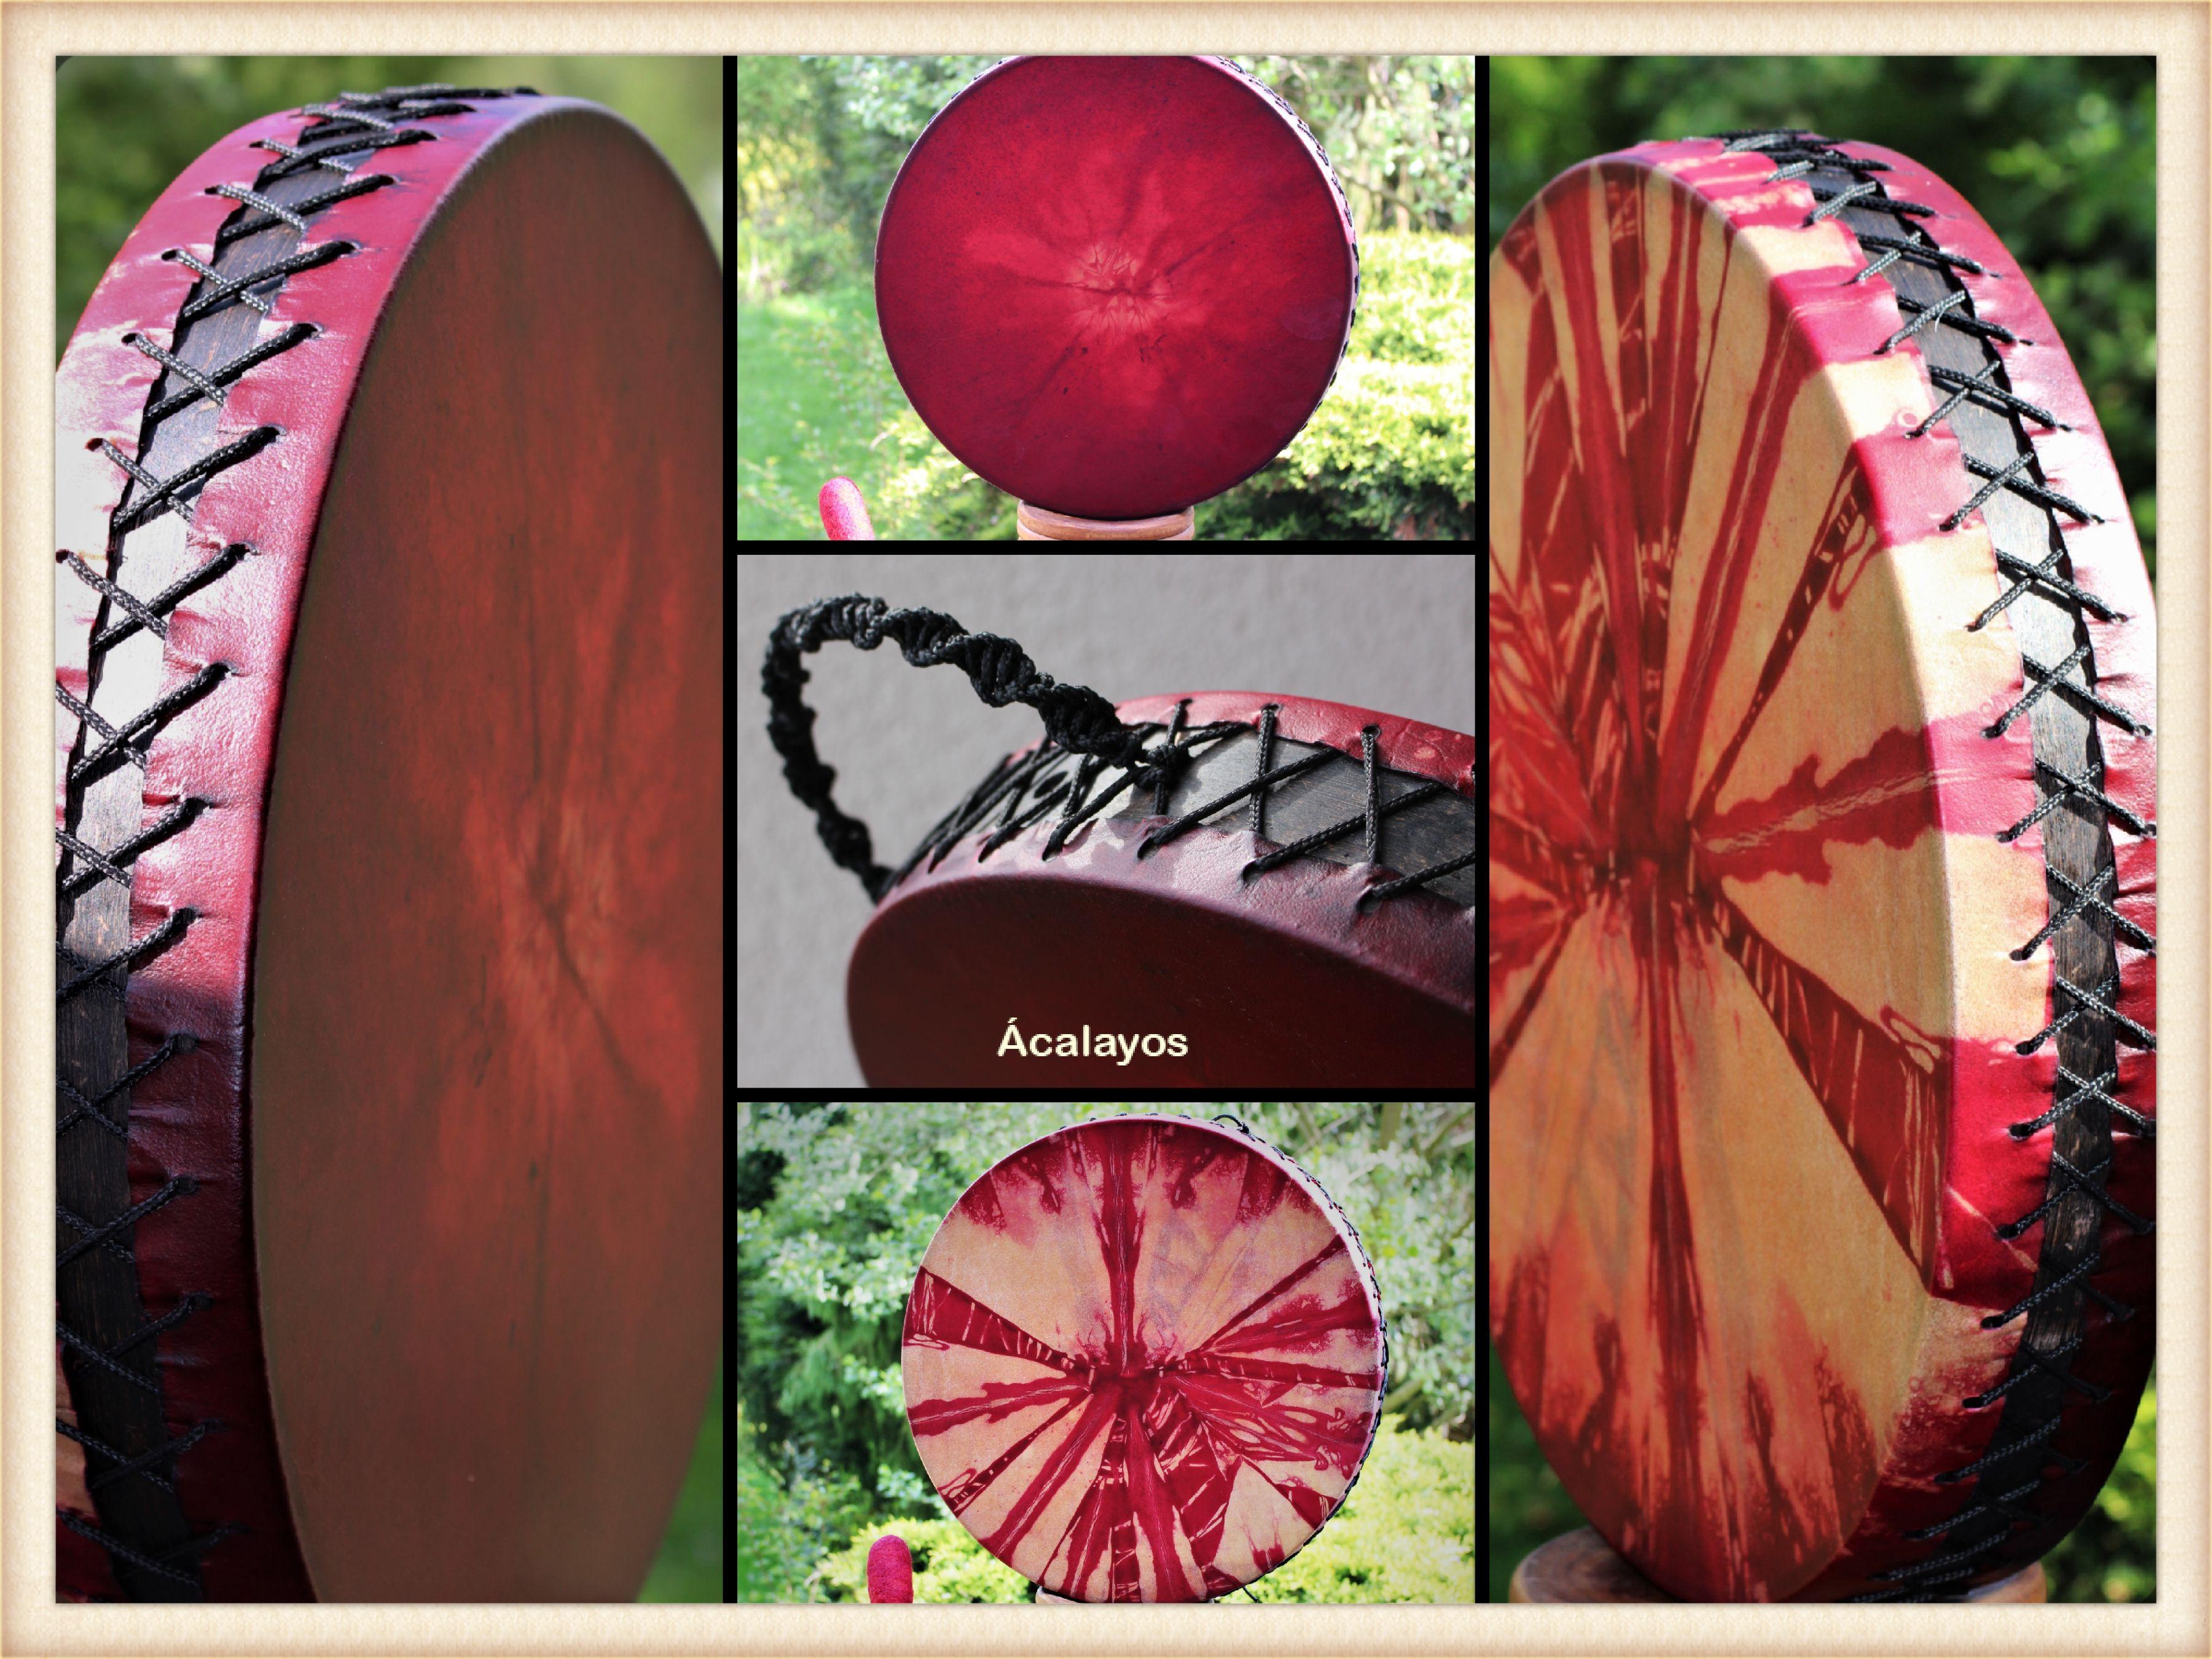 Collage Fotormag Fotormag Fotor1 in Ritual Trommeln /Acalayos